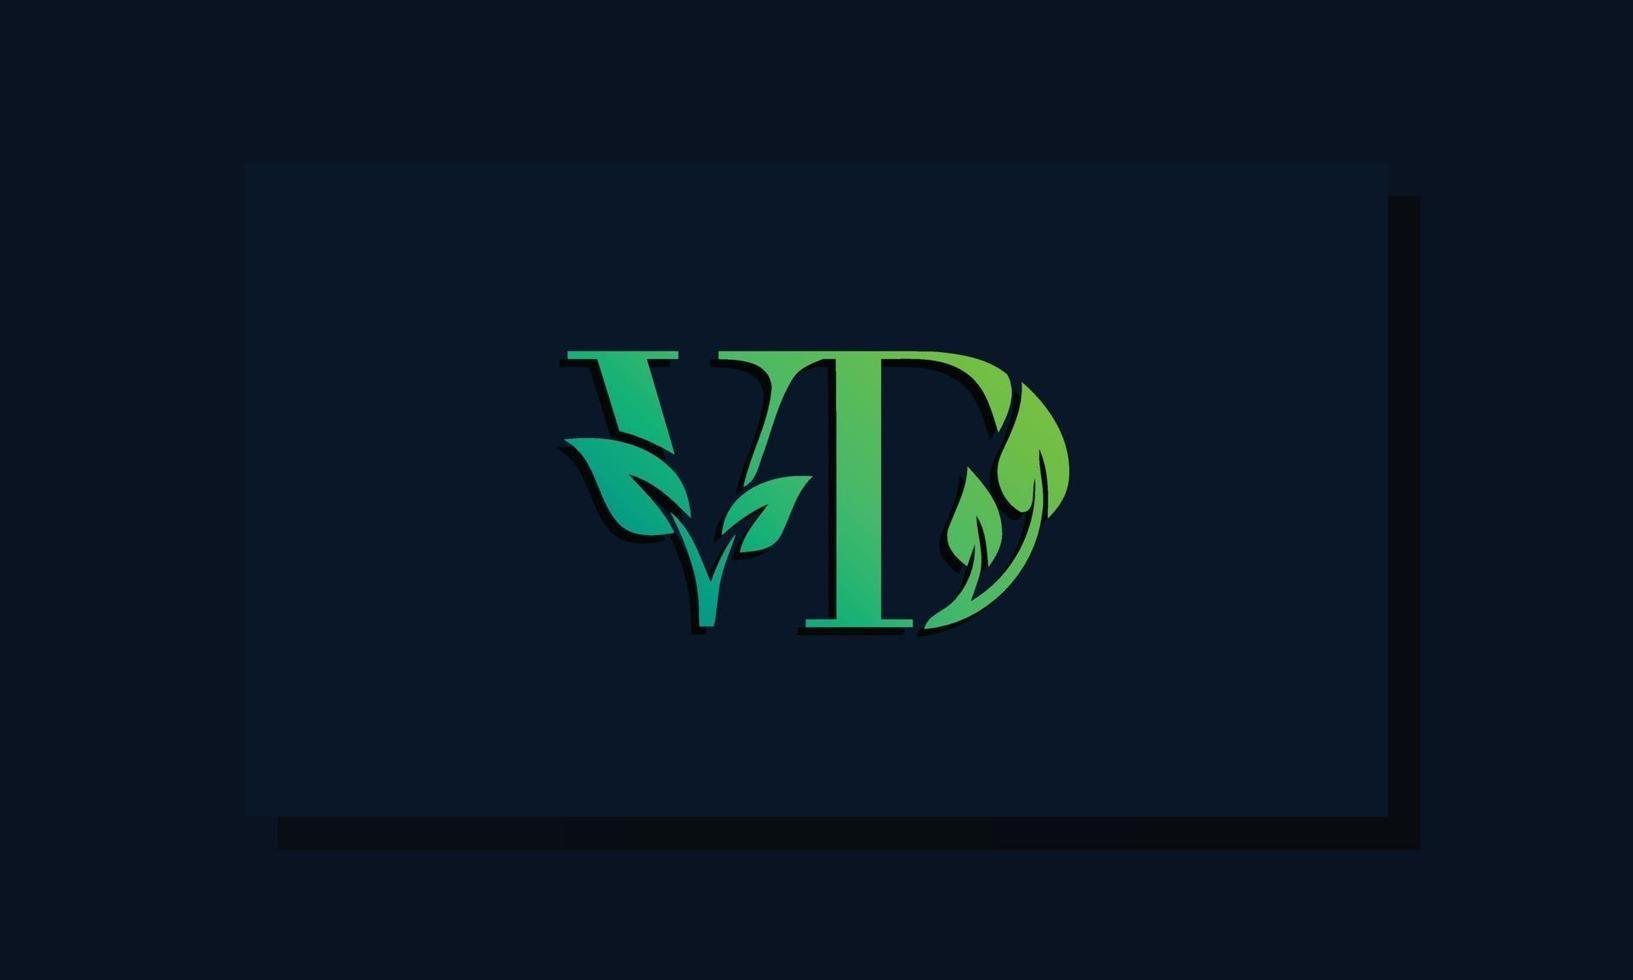 Minimal leaf style Initial VD logo vector